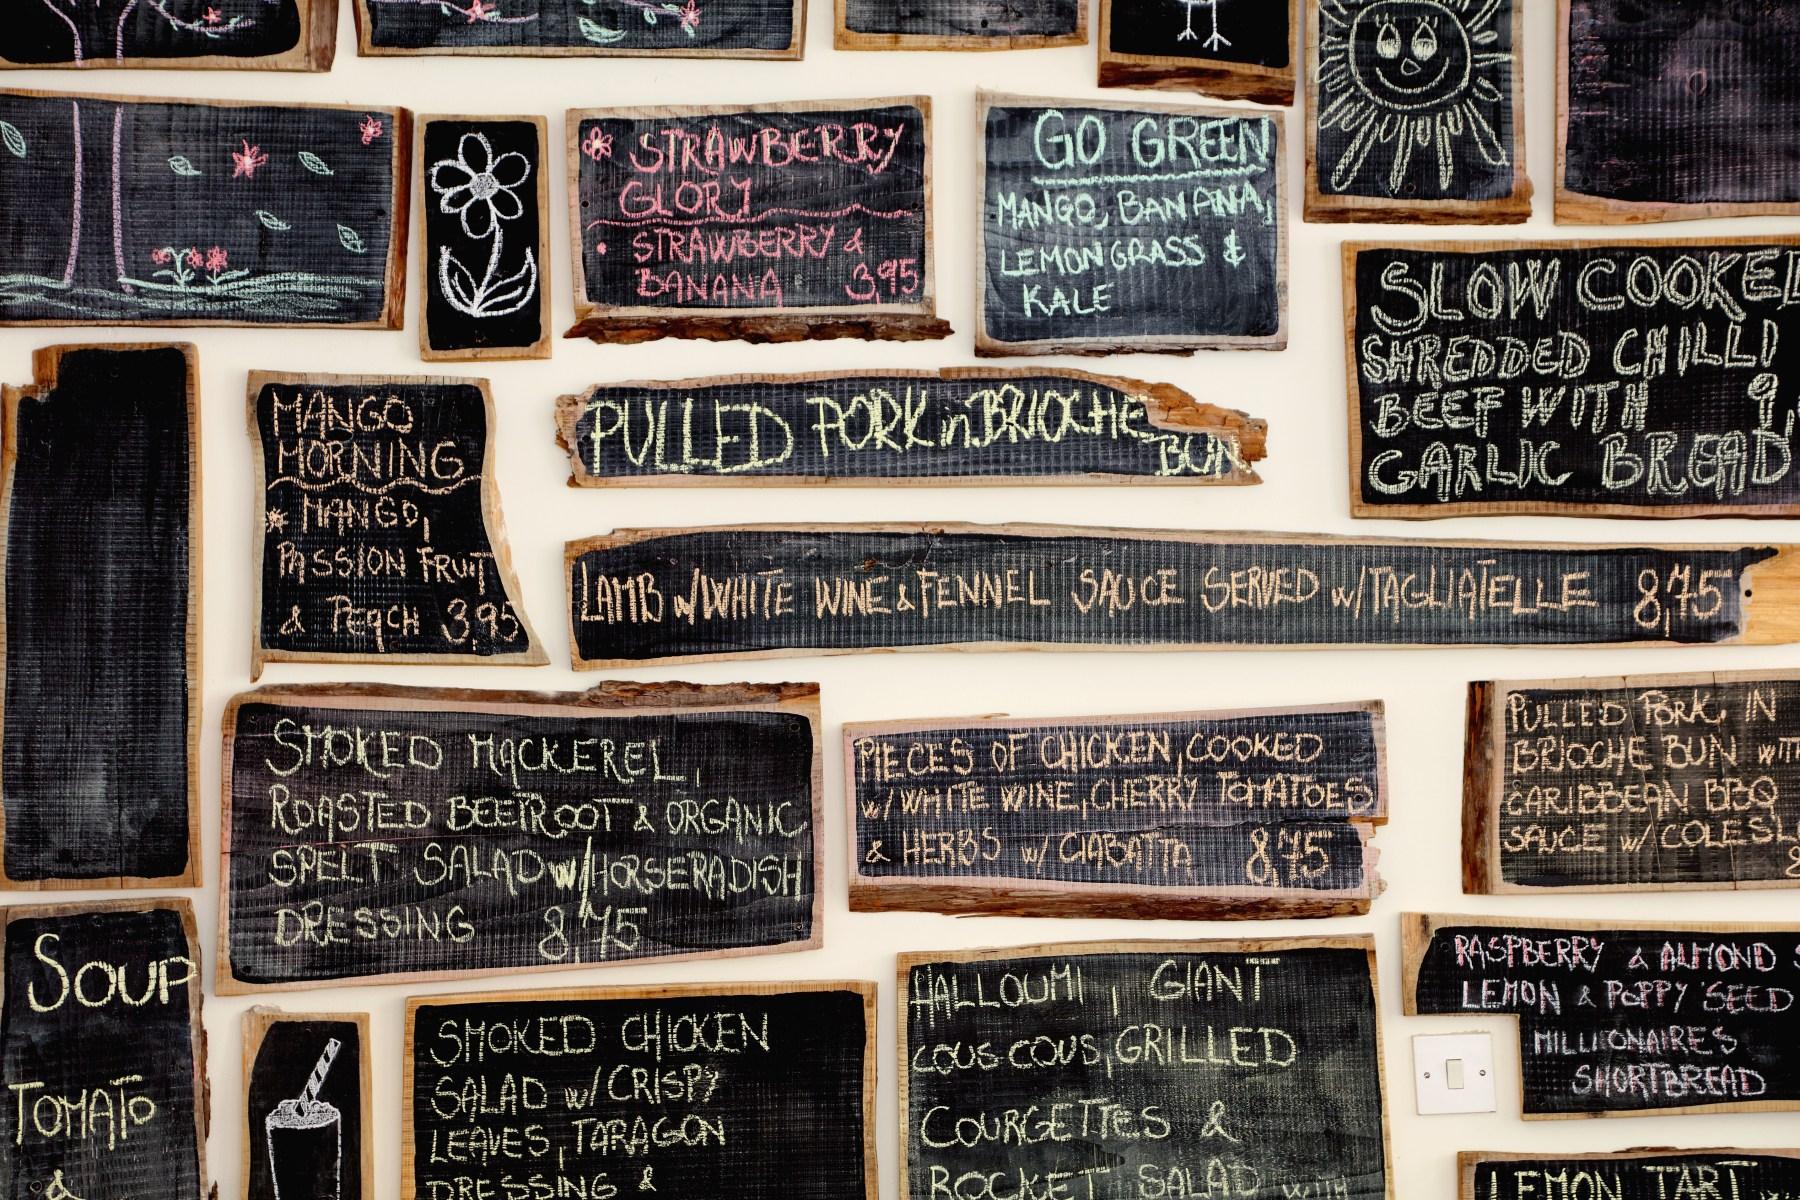 menu peeping